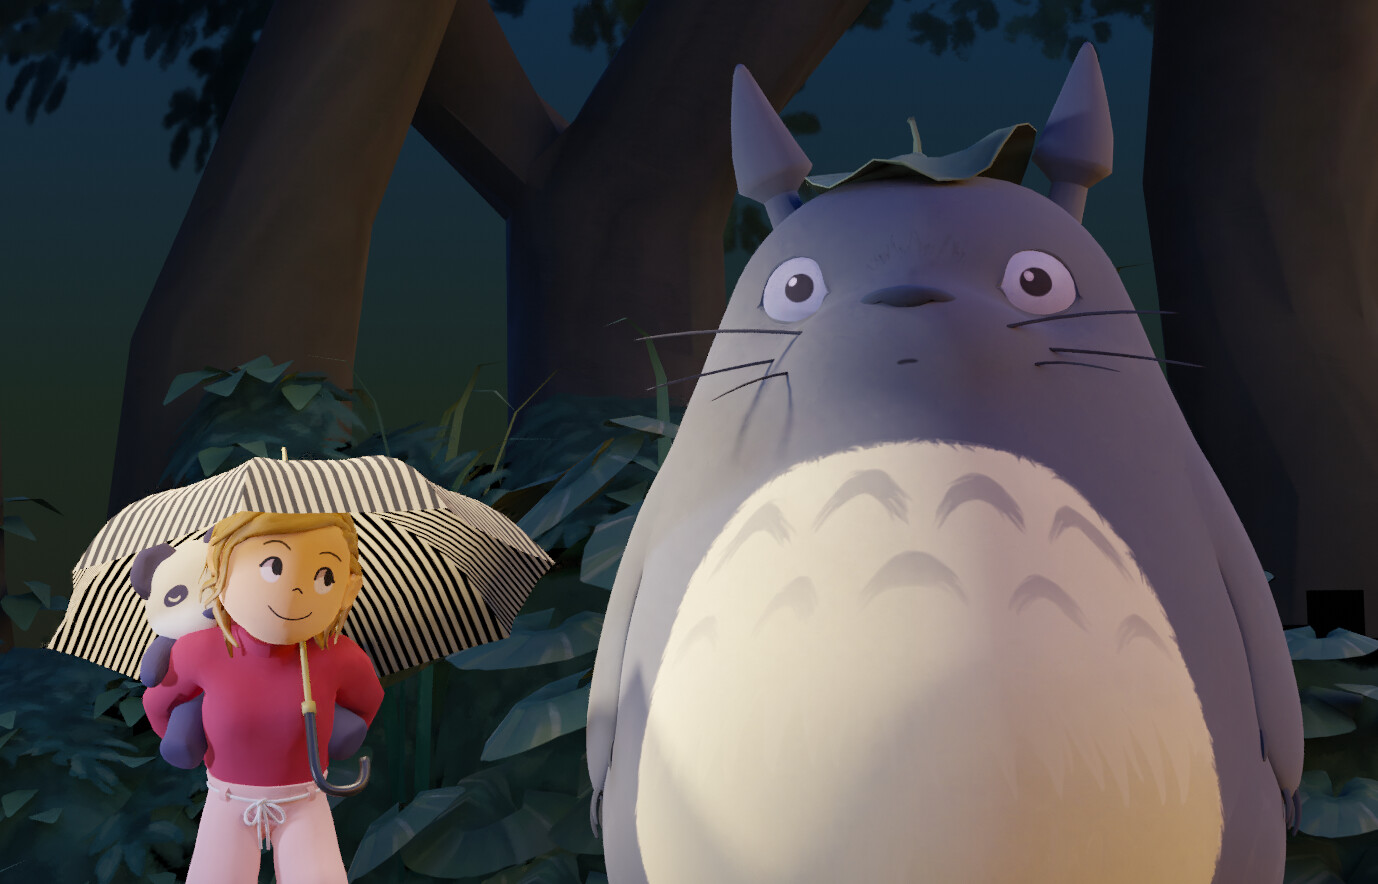 Sarah and Totoro